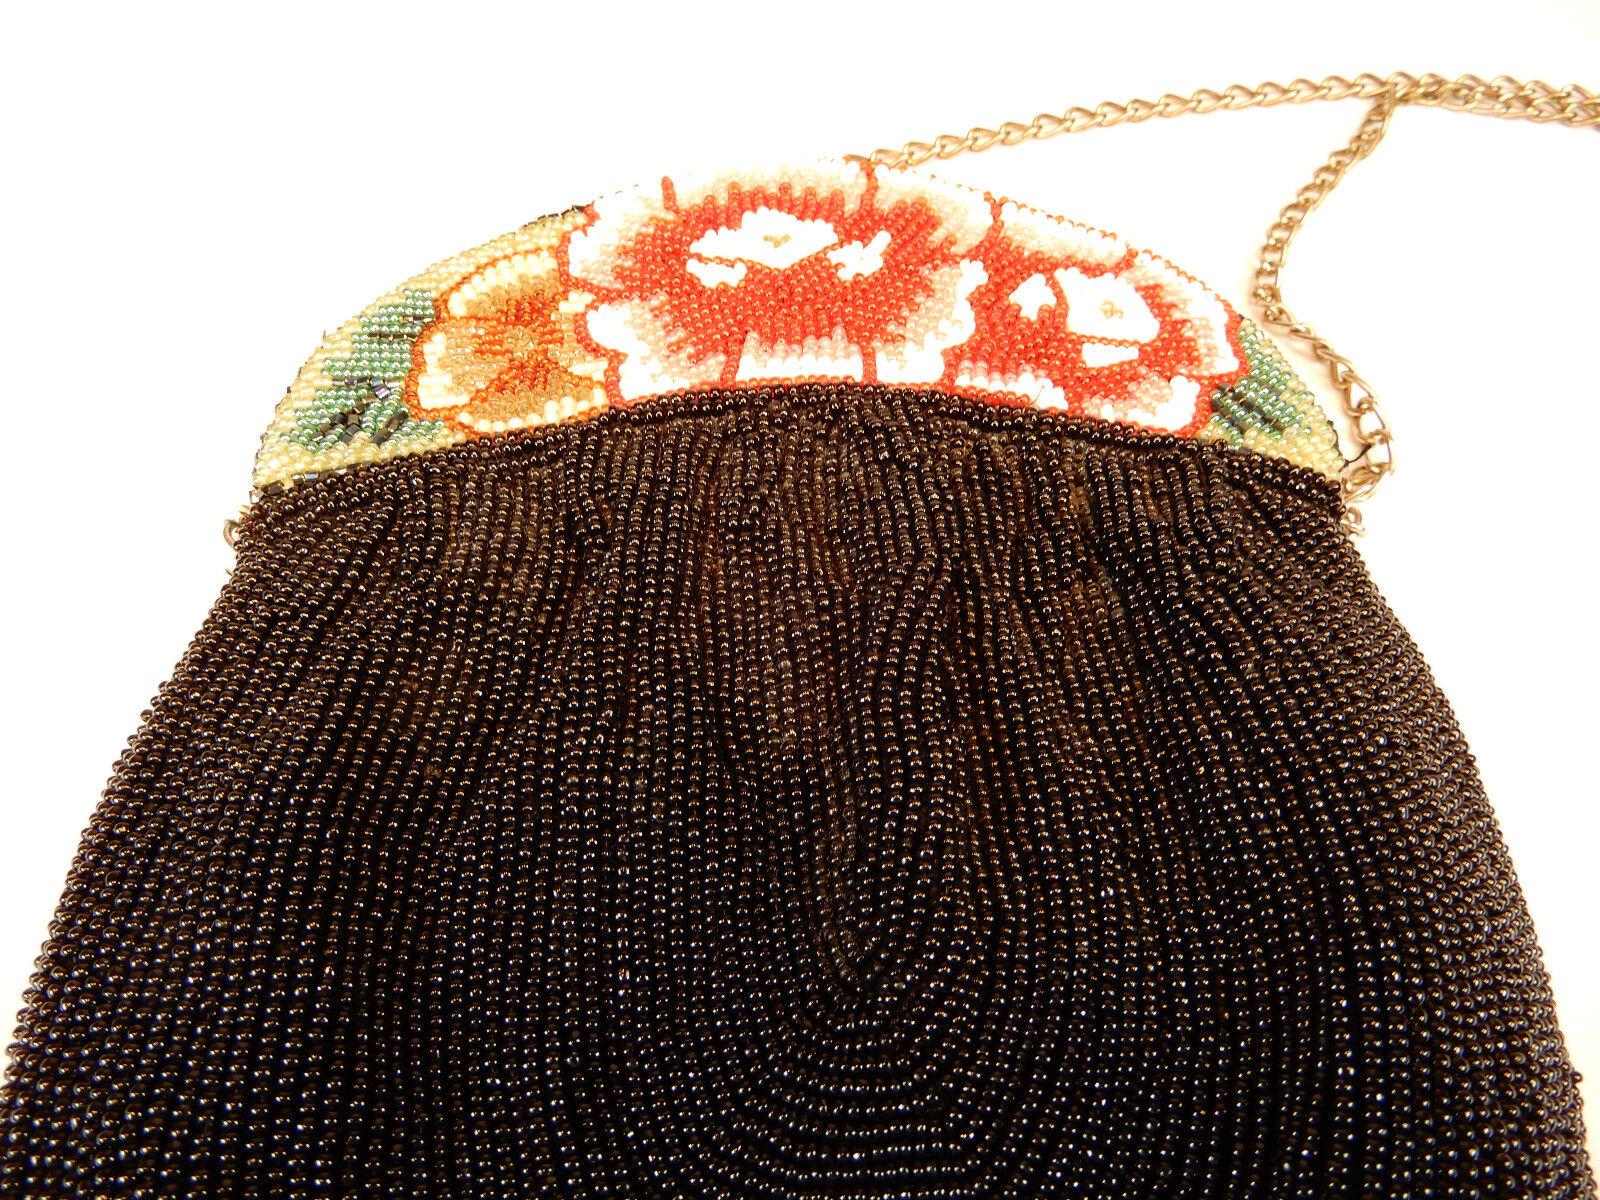 Perles Sachet attaches fines perles SAC NOIR FLEURS PERLES DE DE PERLES VERRE 22 x 17 cm 758d43